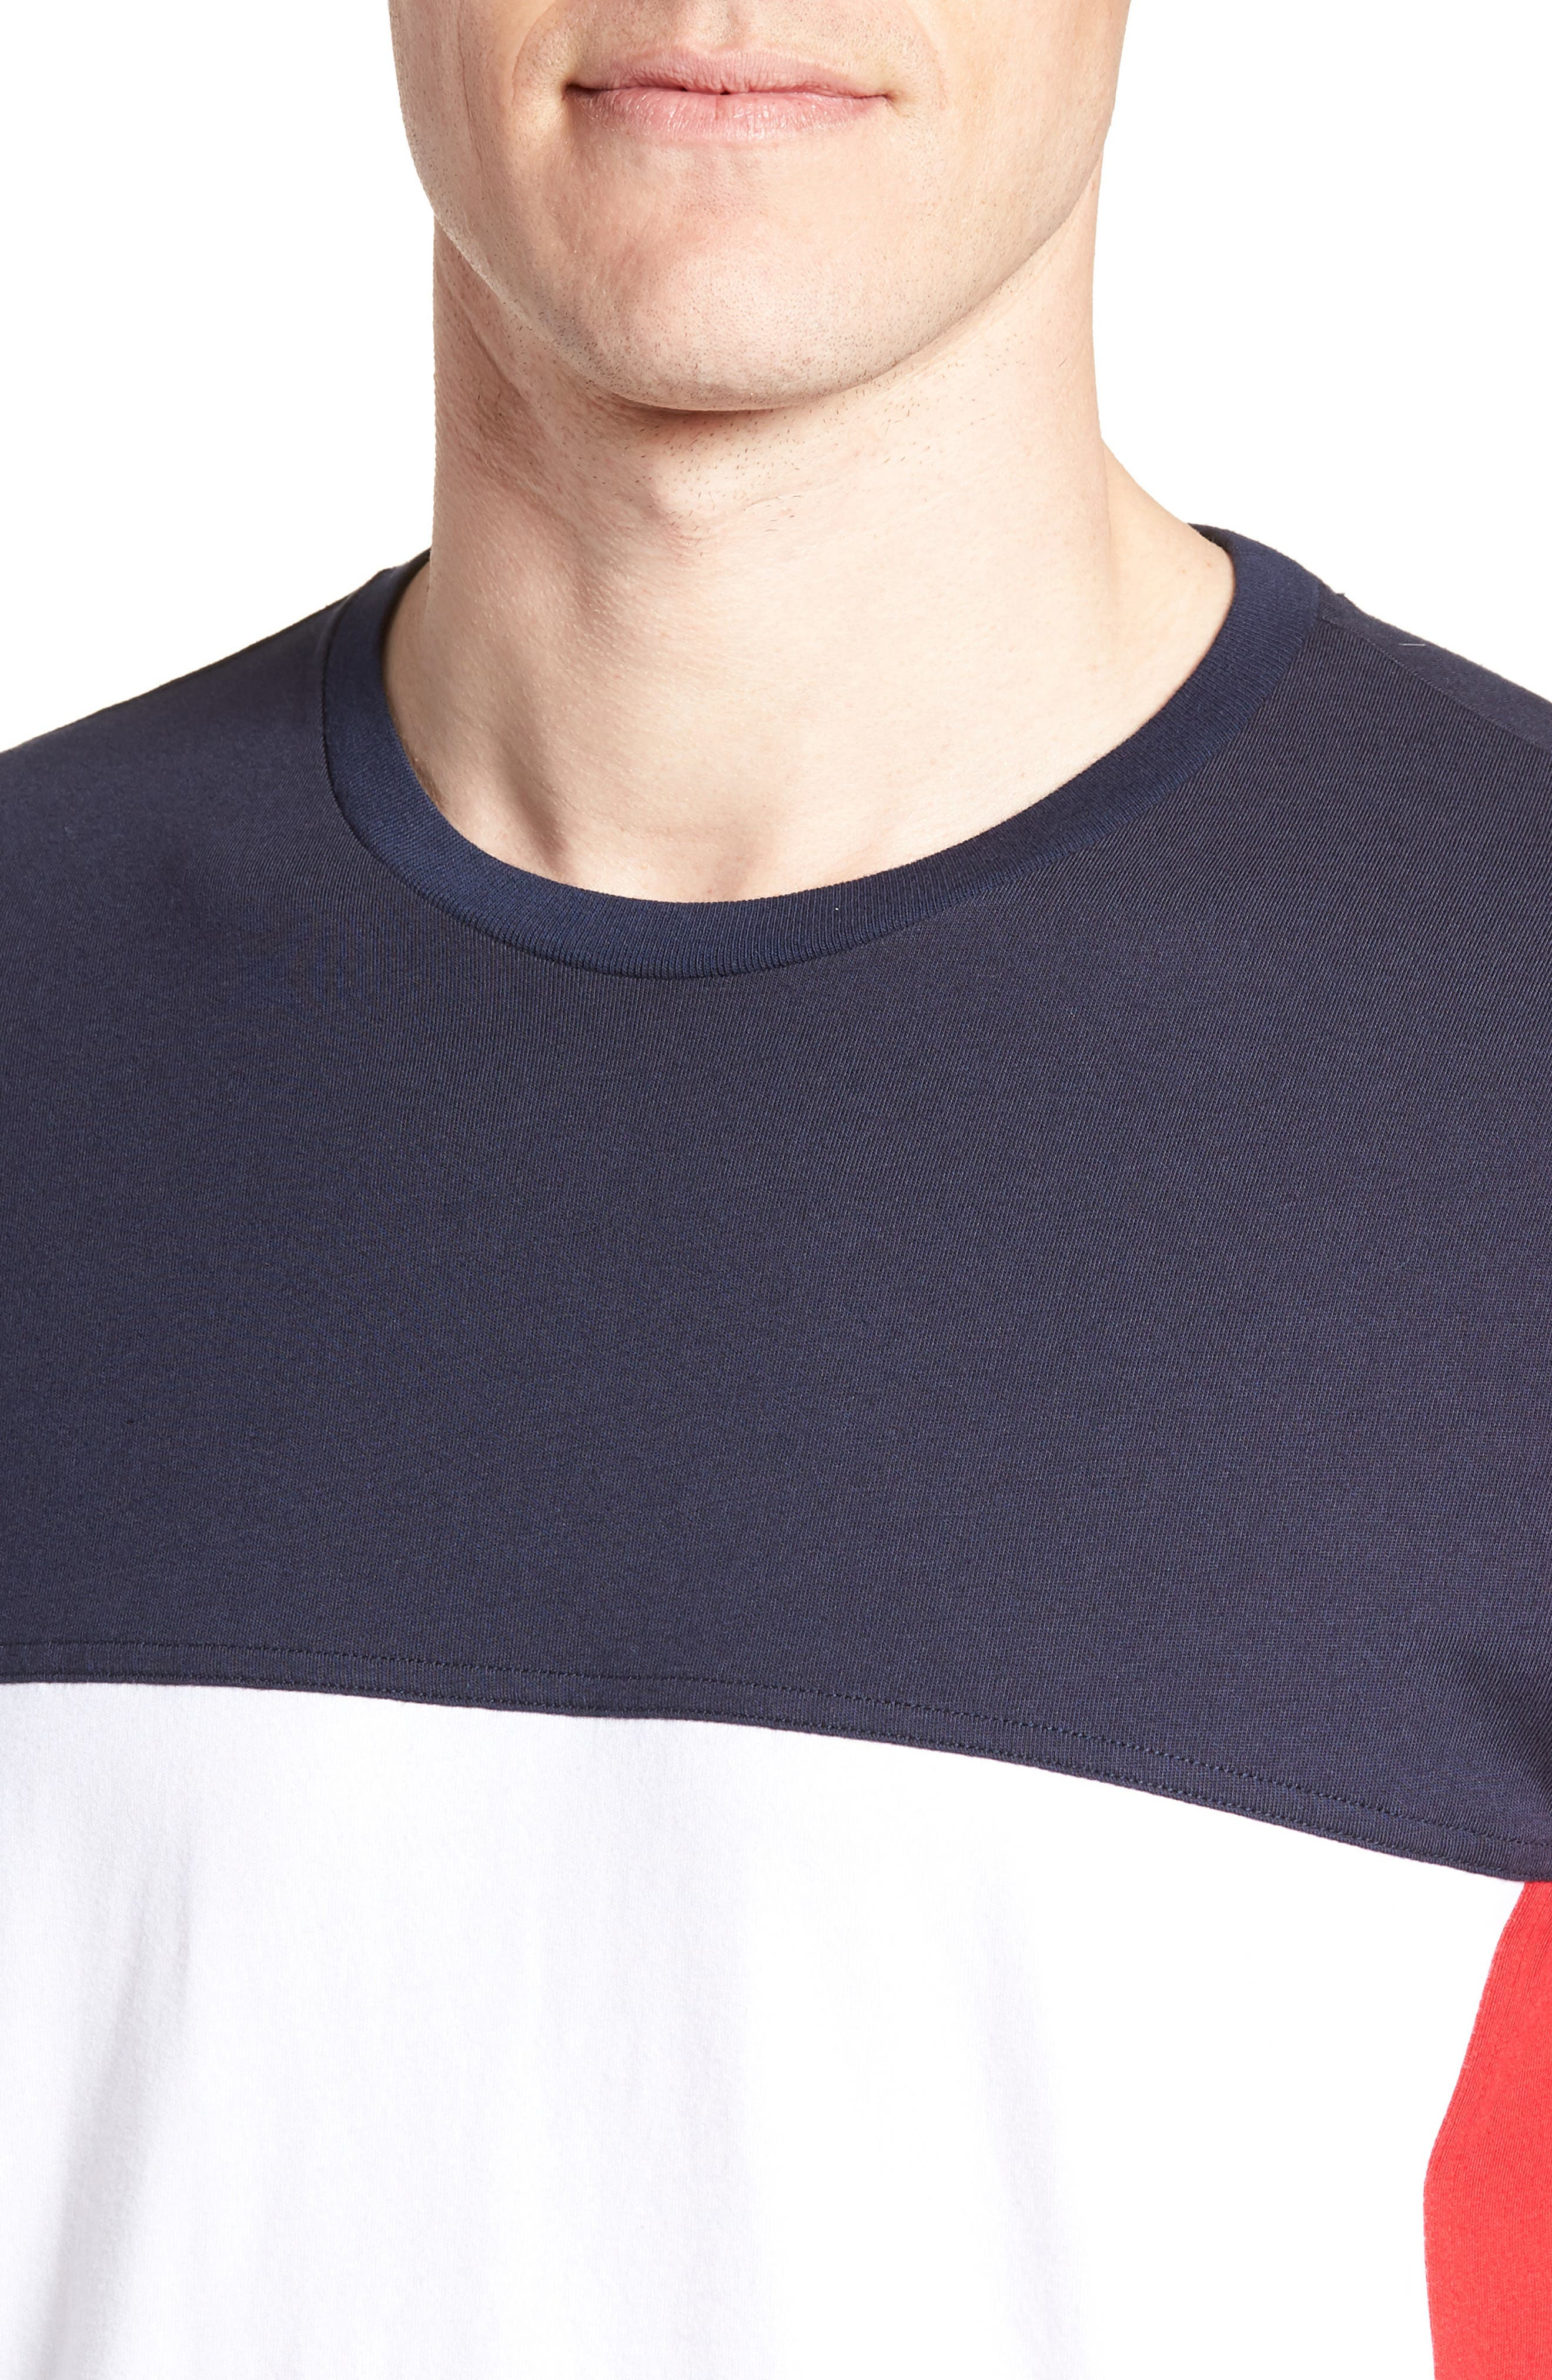 Colorblock T-Shirt,                             Alternate thumbnail 4, color,                             Dark Navy